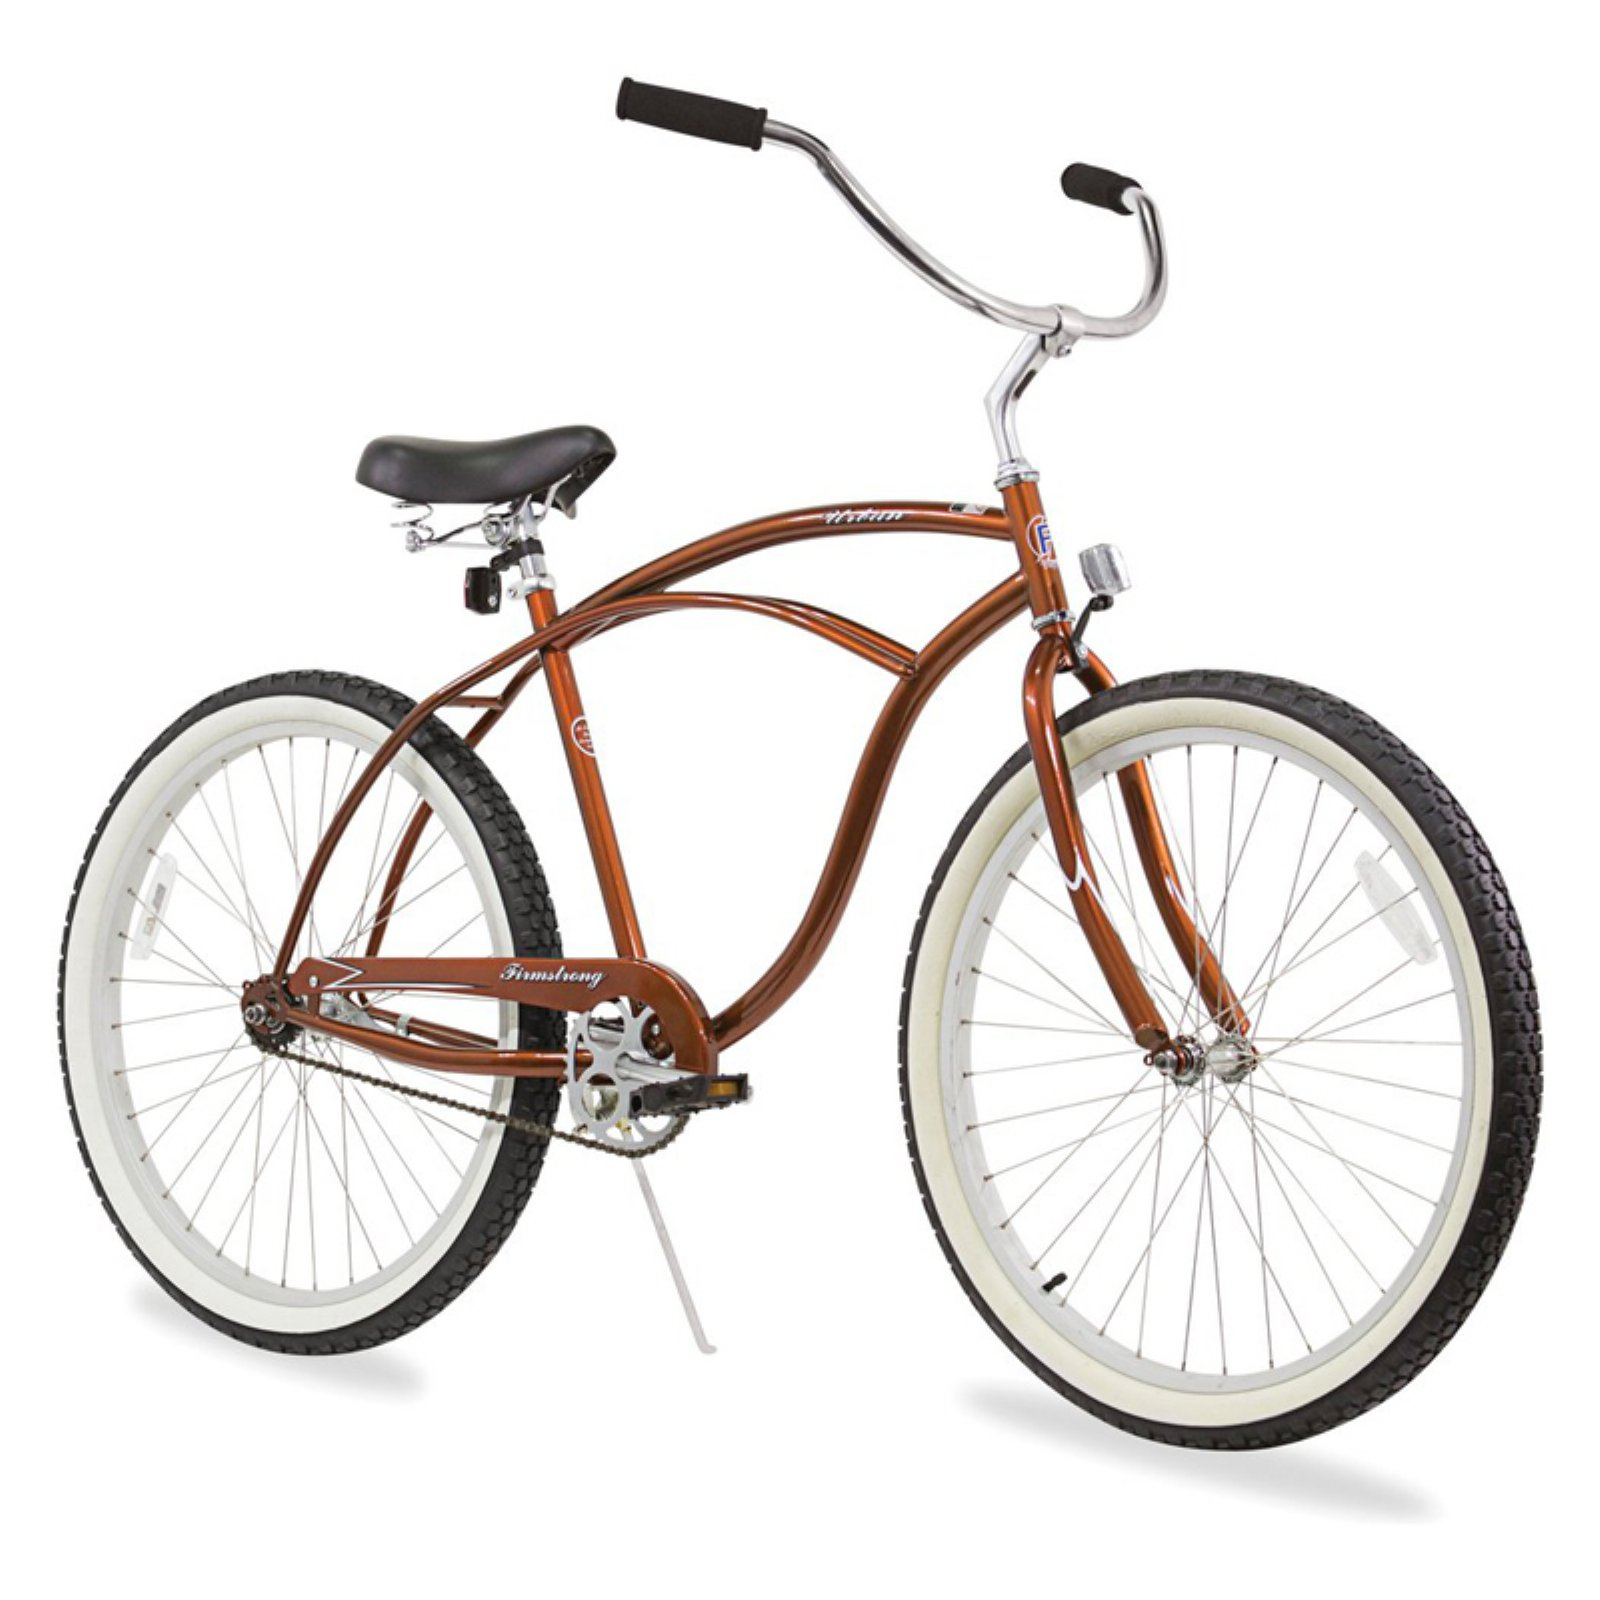 112f9929fbc Firmstrong Urban Man 26 in. Single Speed Beach Cruiser Bicycle Gloss Brown